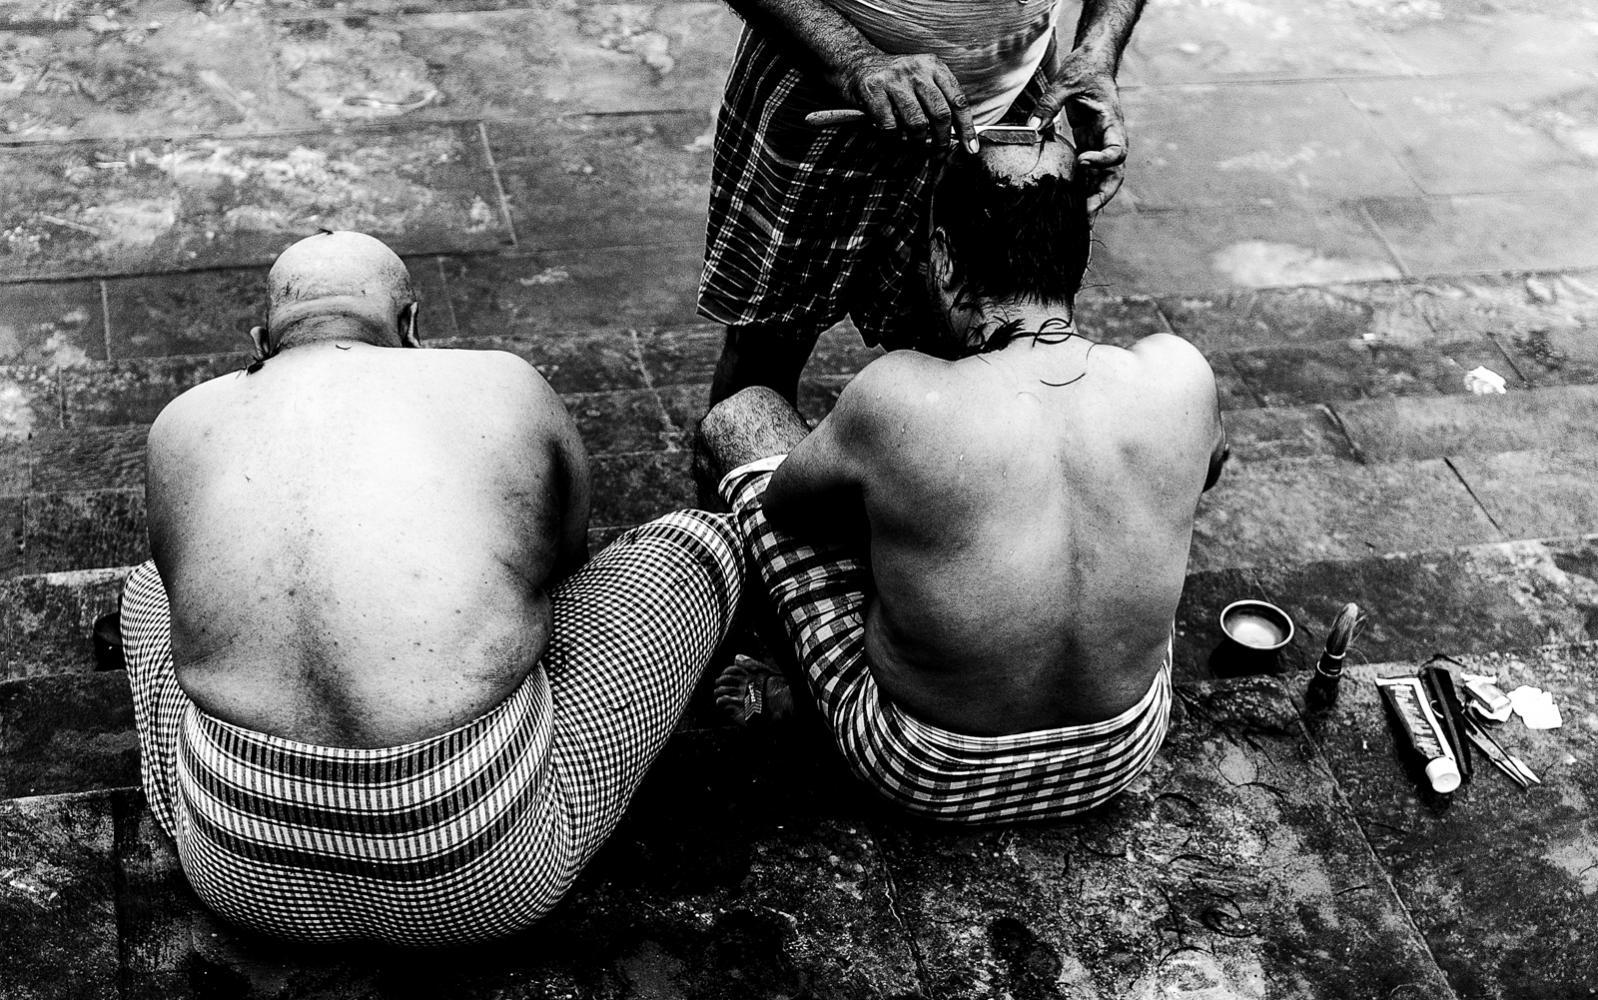 Photography image - Loading Akshat-Bagla-People-Shaving.jpg